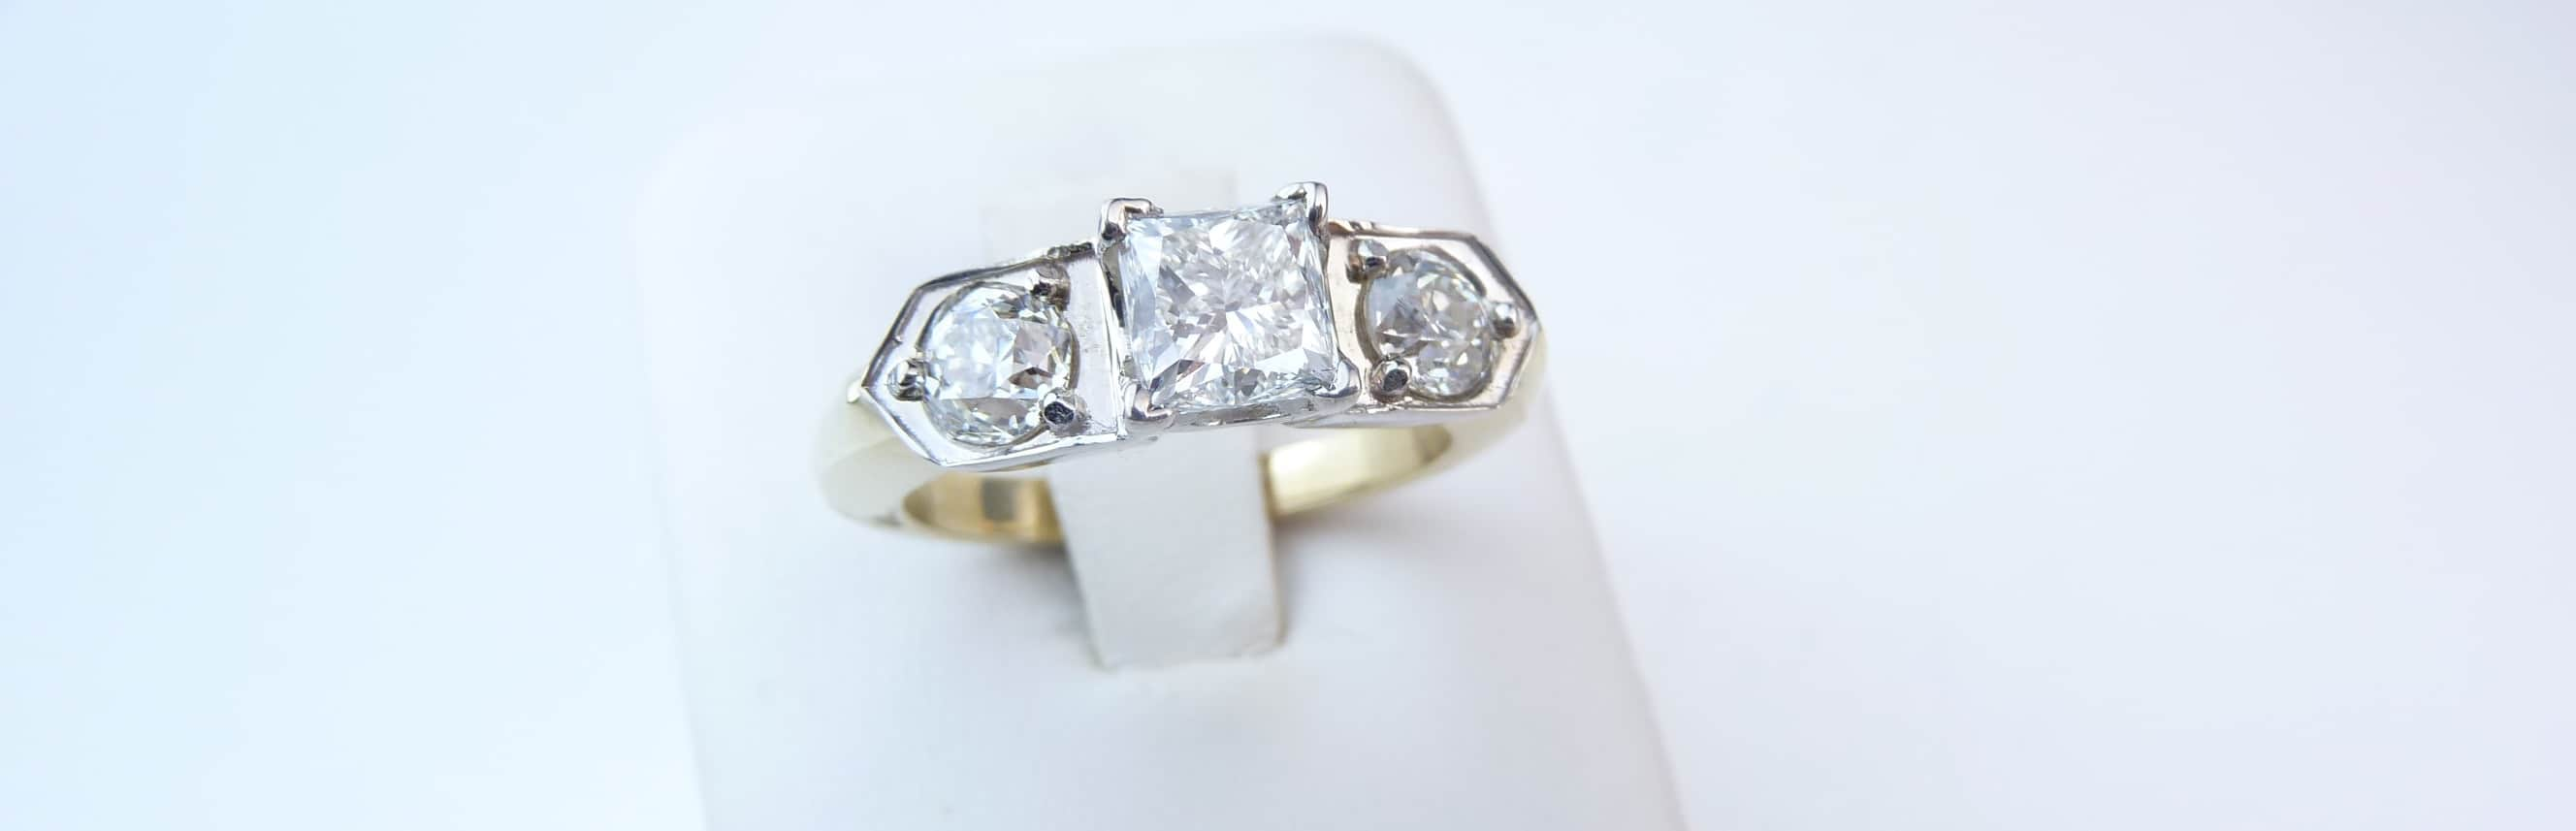 karenna maraj engagement rings